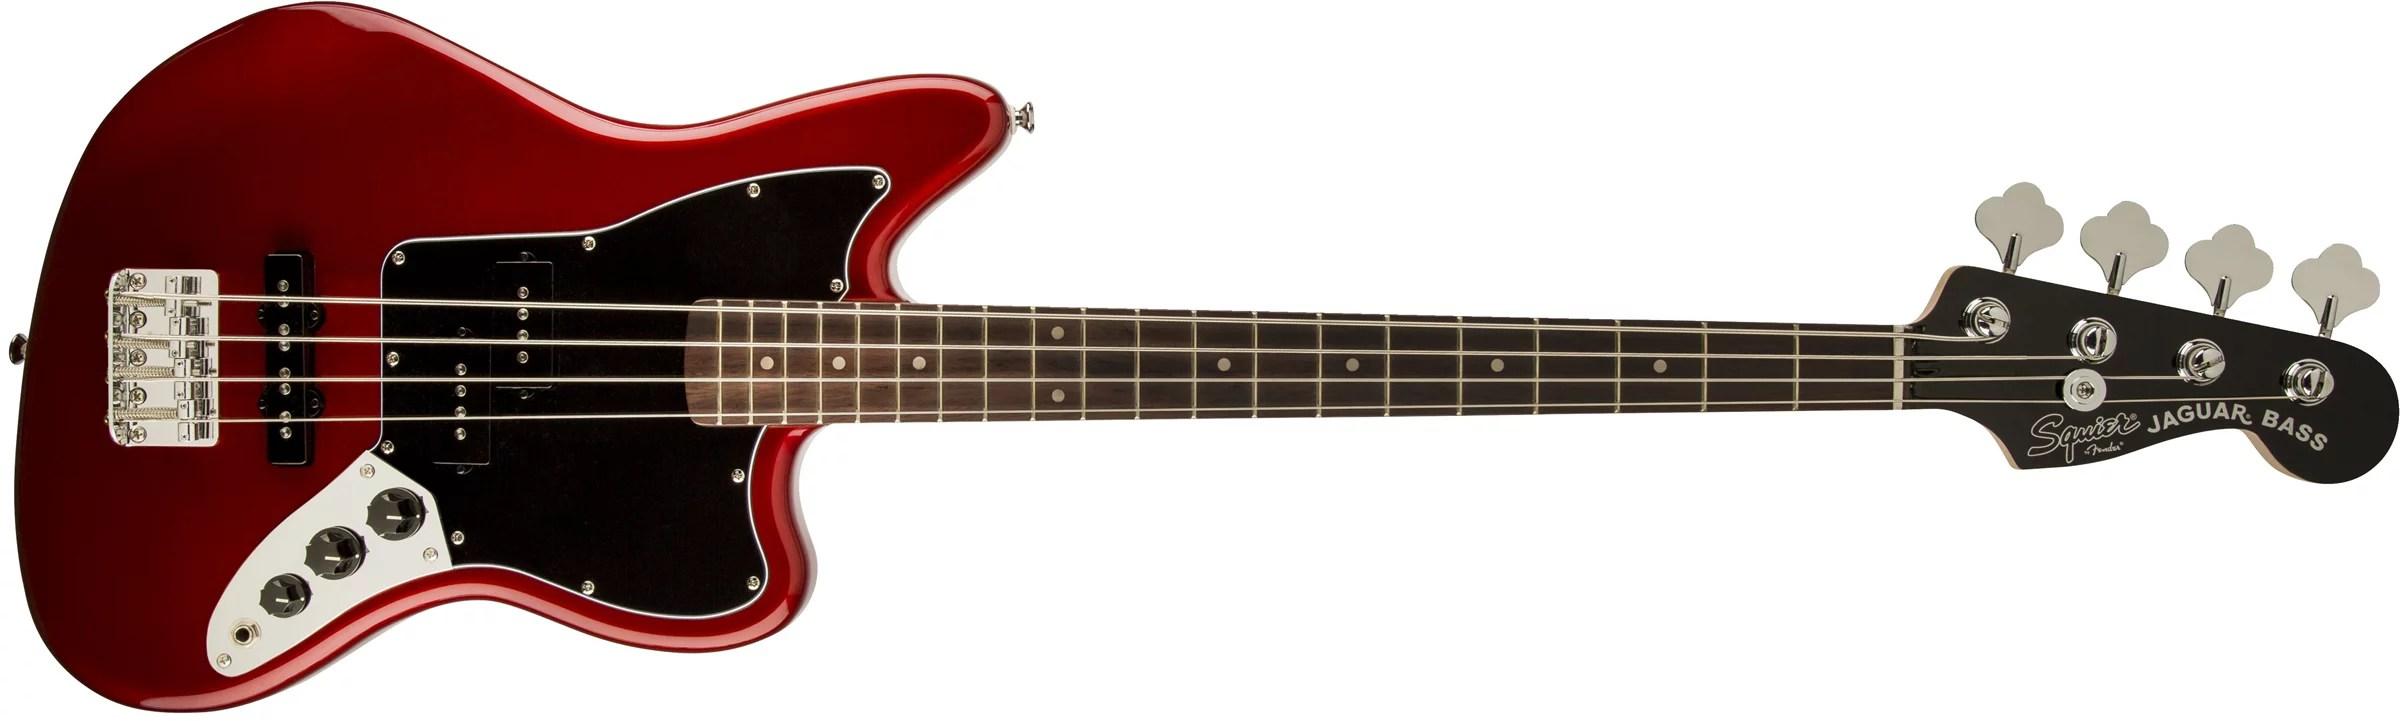 Fender Squier Vintage Modified Short Scale Jaguar Bass Guitar - Candy Apple Red - Walmart.com